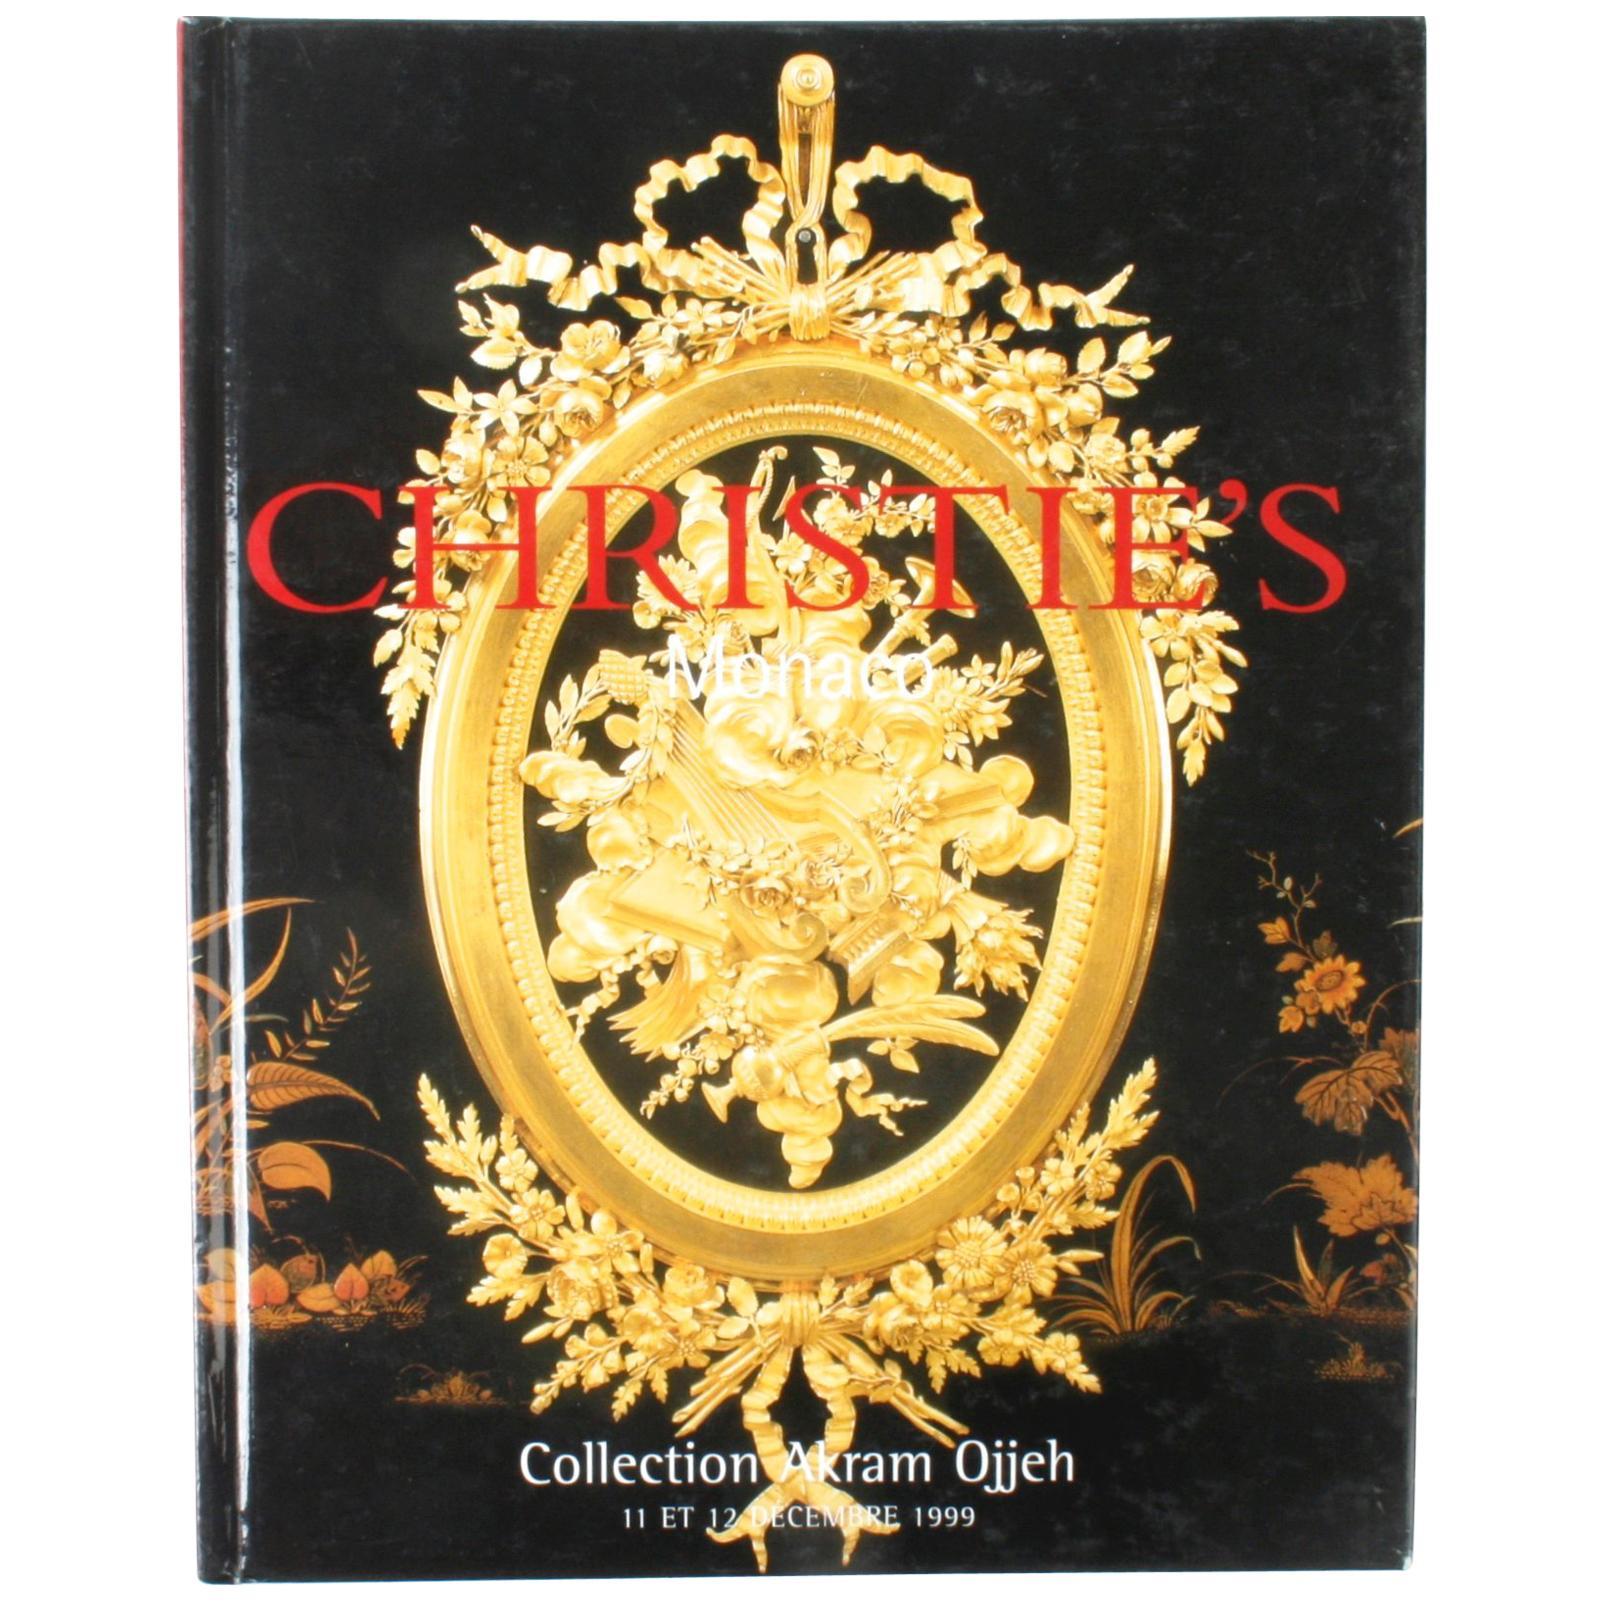 Christie's Monte Carlo, Collection Akram Ojjeh